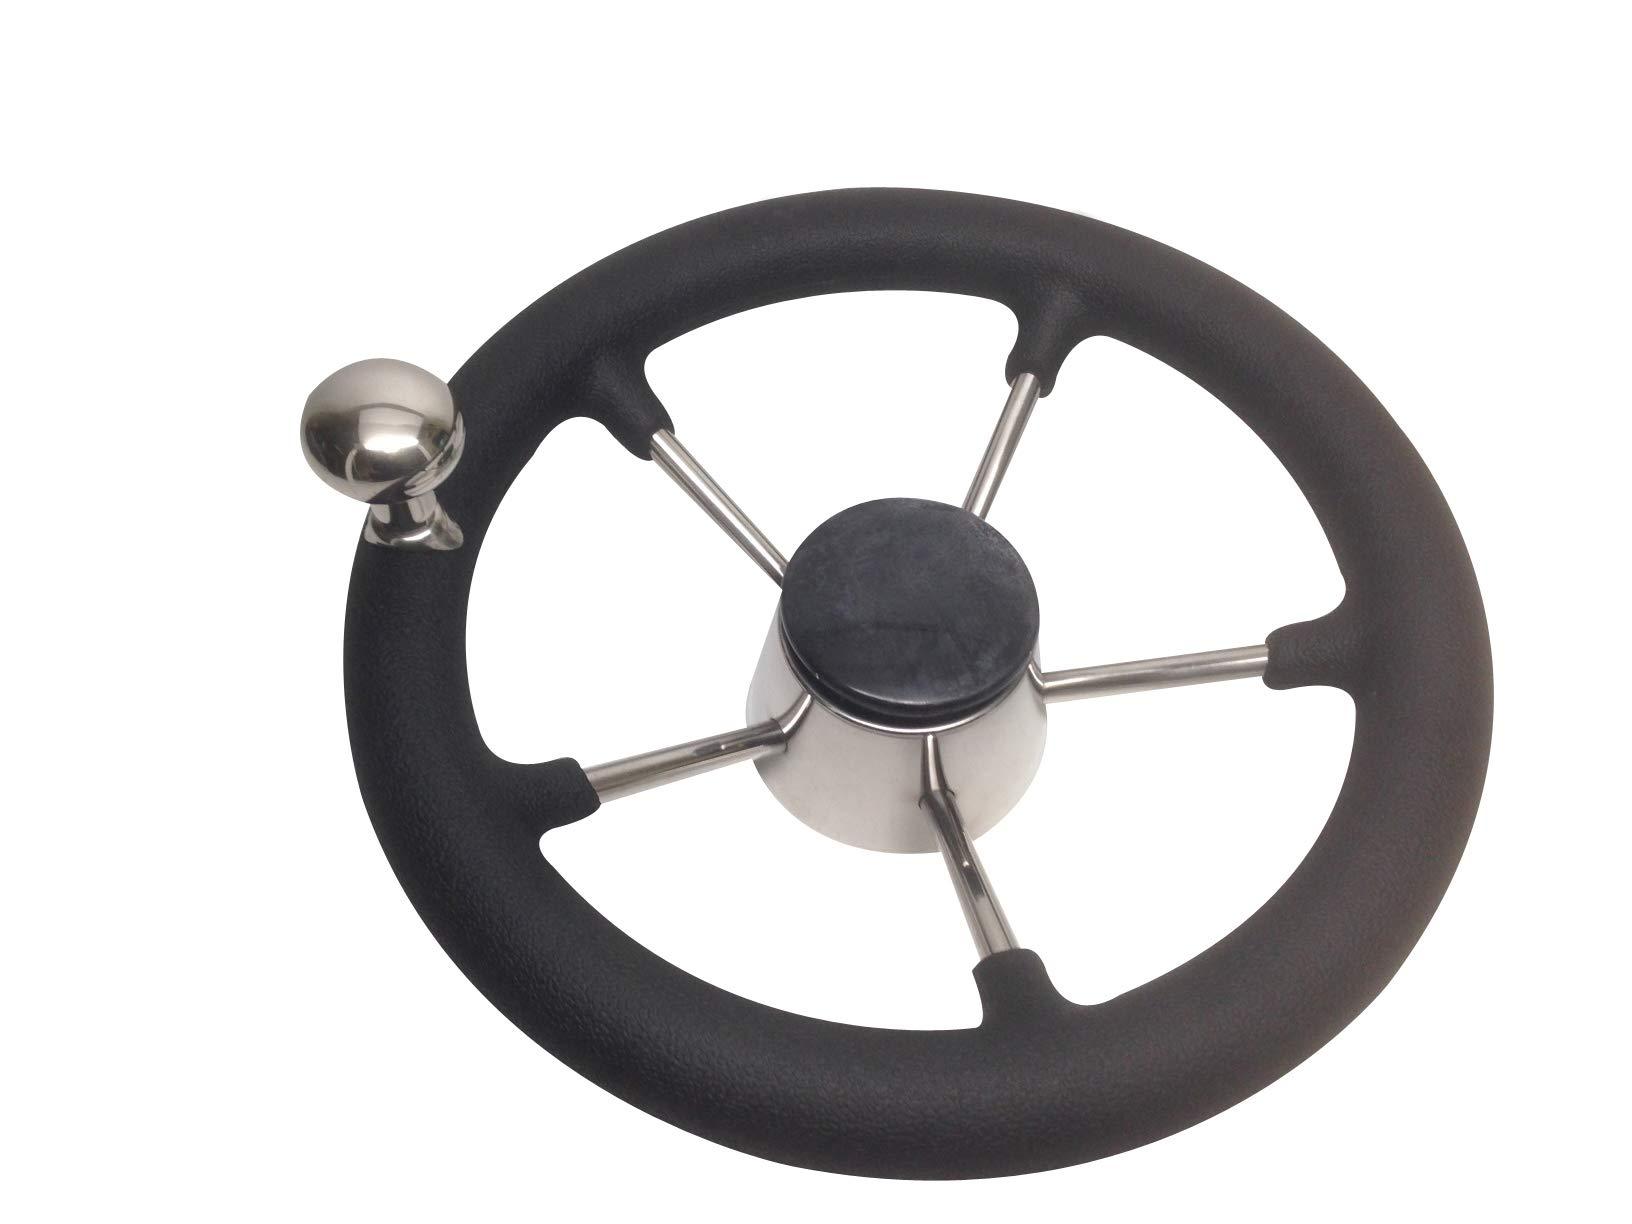 Pactrade Marine 11'' Destroyer SS Steering Wheel 5 Spoke Foam Grip Control Knob by Pactrade Marine